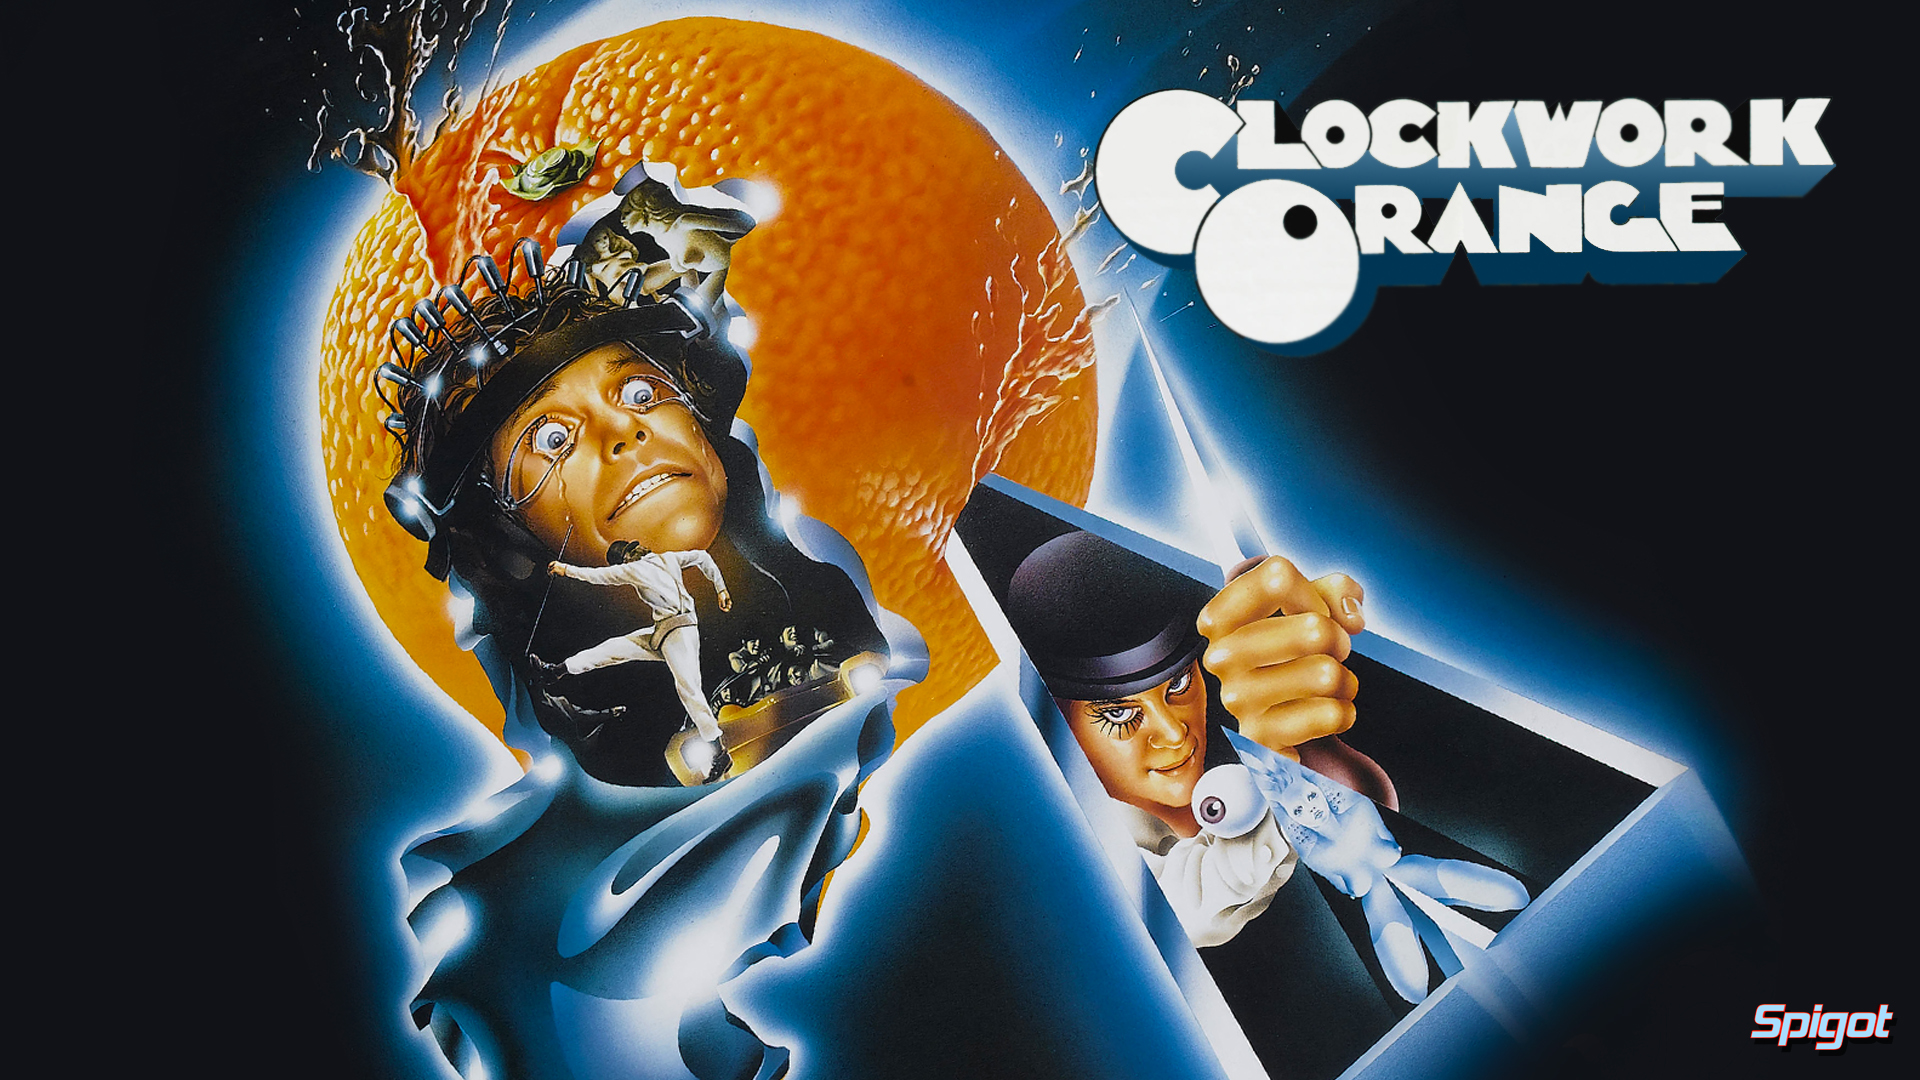 A Clockwork Orange | George Spigot's Blog A Clockwork Orange Wallpaper